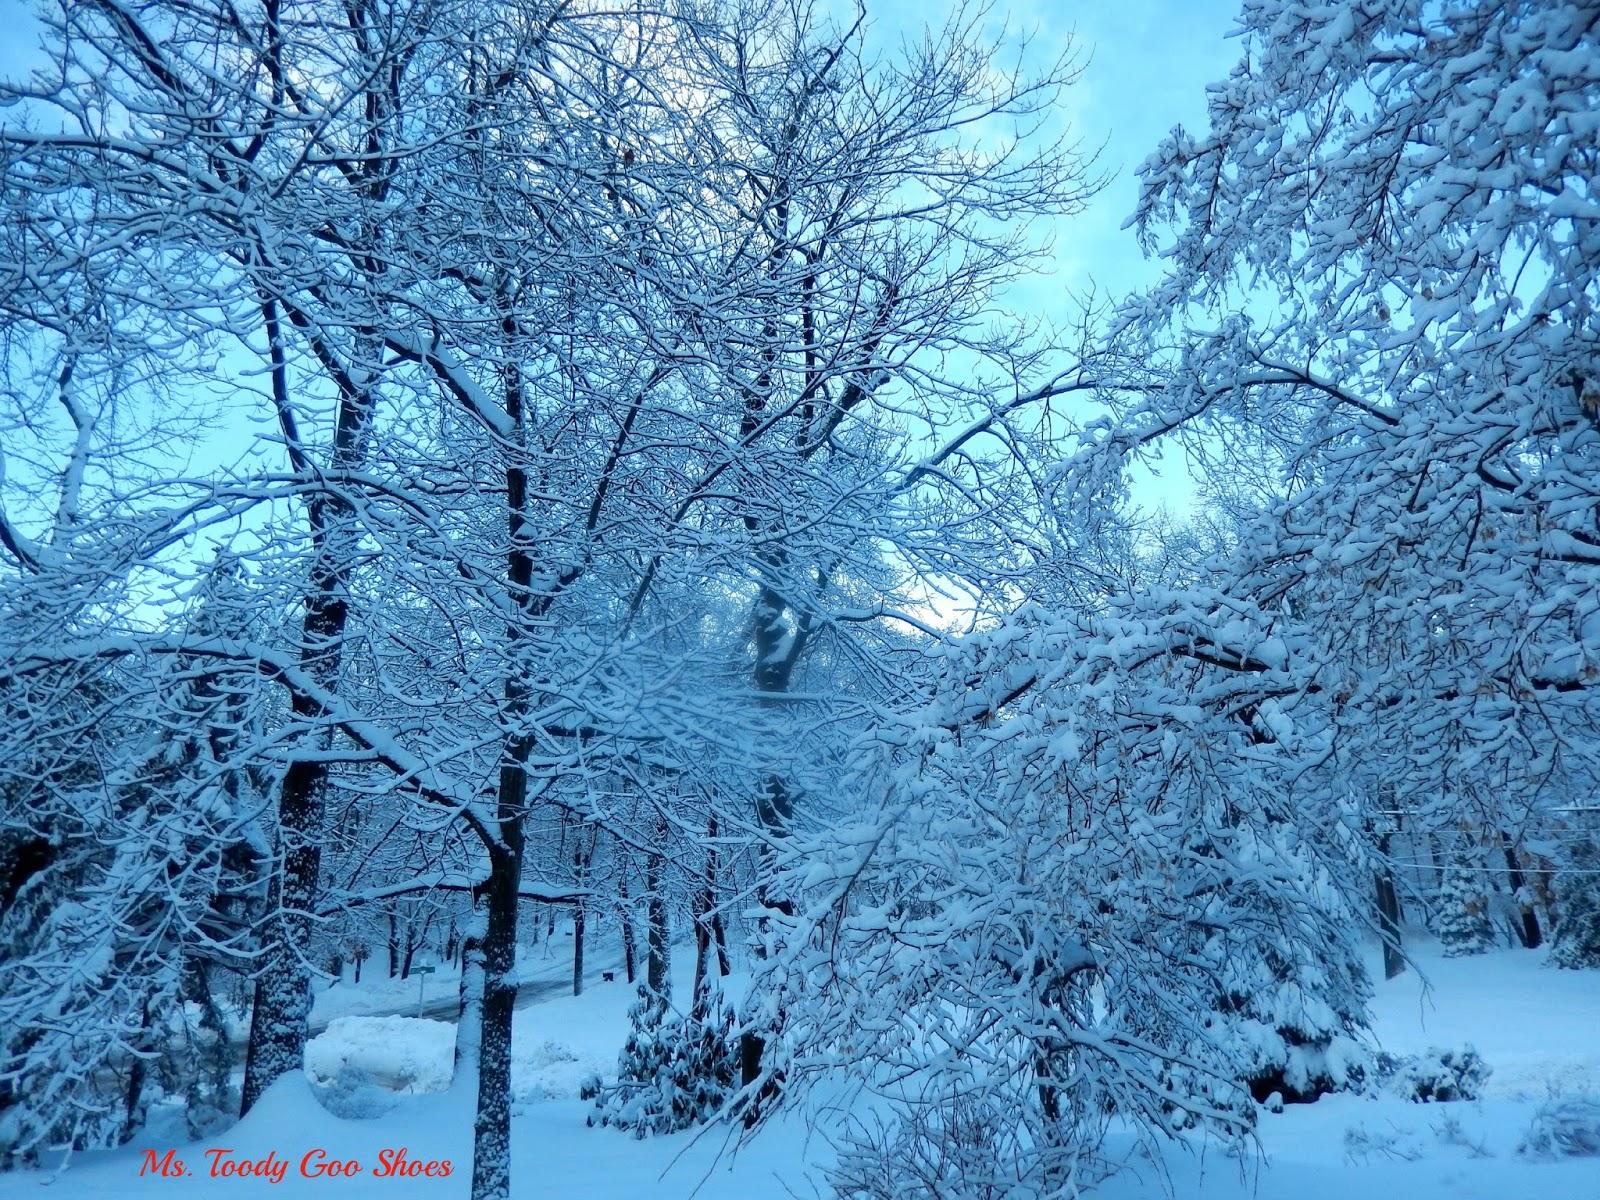 Winter Scenes --- Ms. Toody Goo Shoes